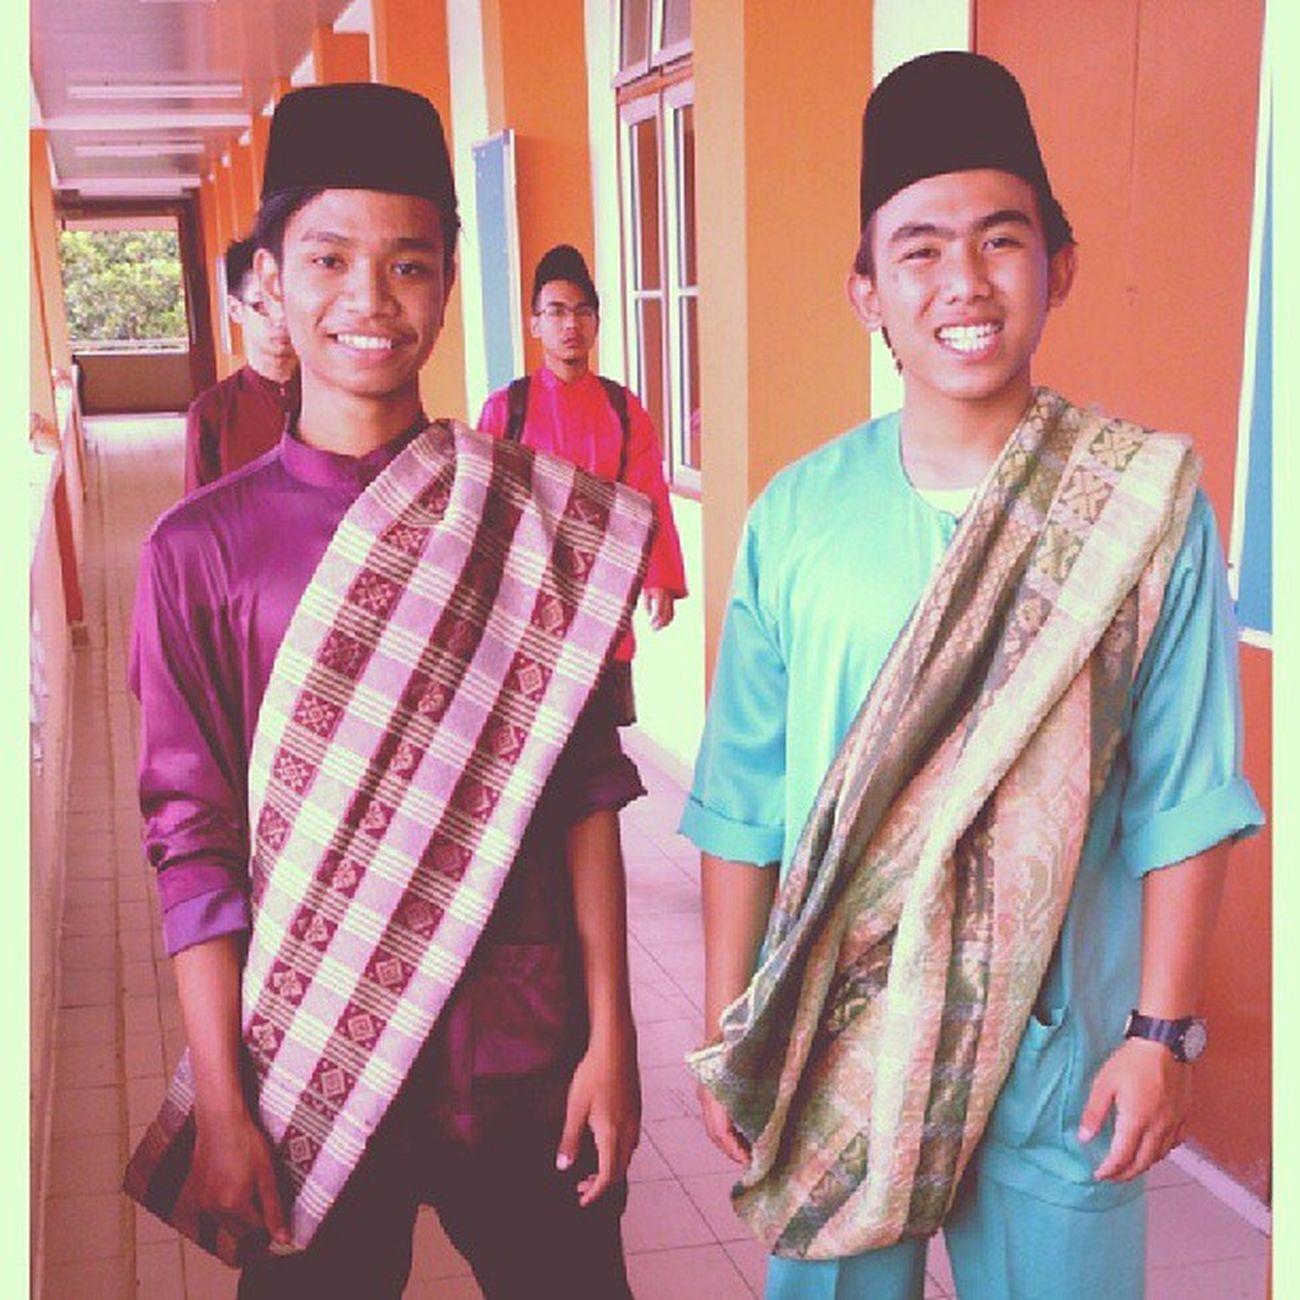 Bersama abang Jawa celop @azril_shah di majlis jamuan hari raya yang tak berapa nak cukup sponsor. Muka tetap kena happy. Kmns Raya2013